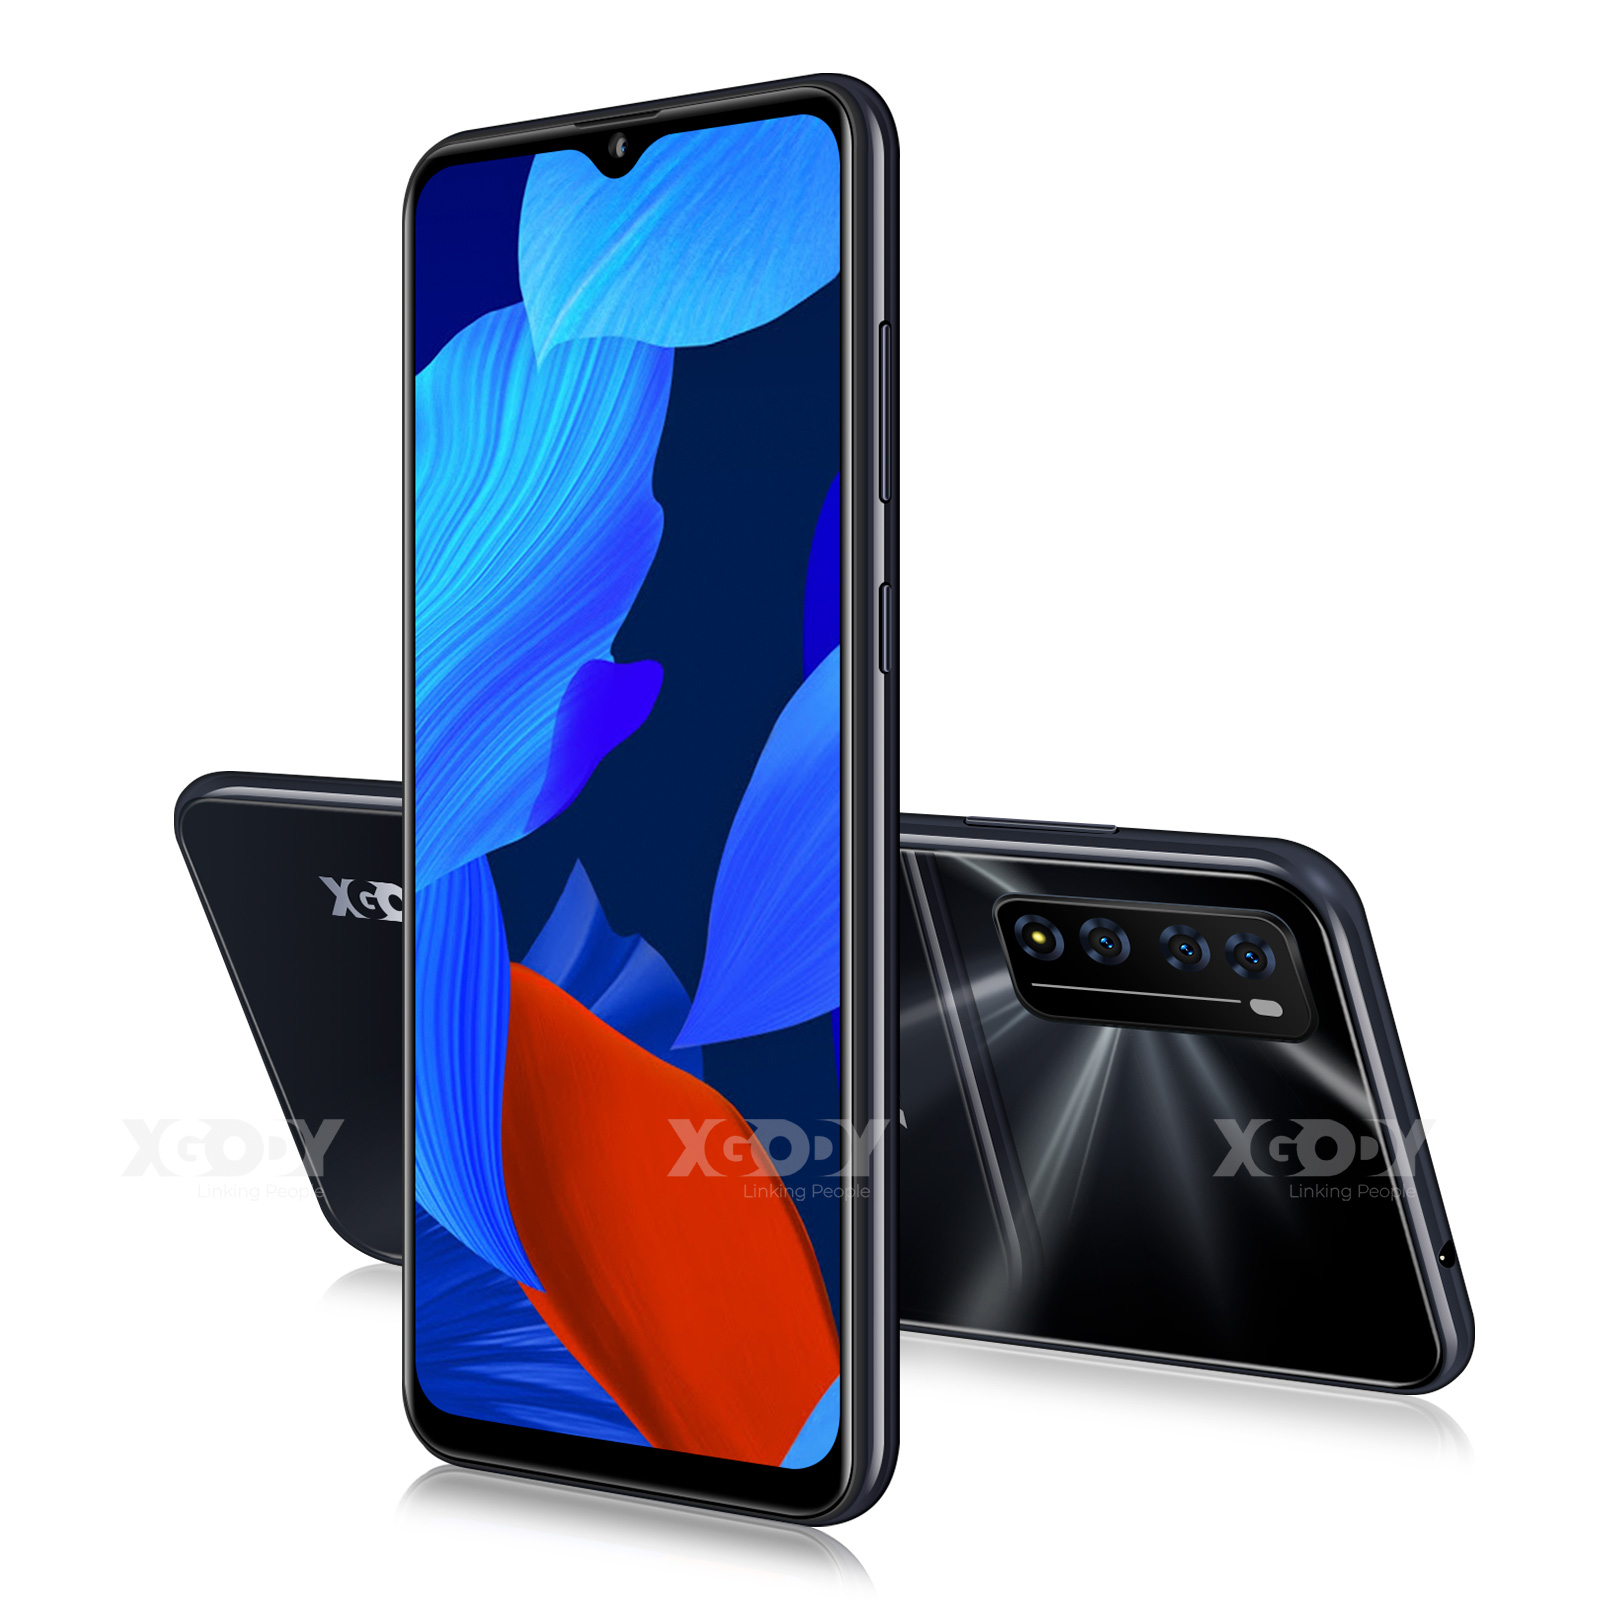 XGODY New Smartphone Android 10.0 2GB 16GB Celulars 6.6'' 19:9 HD Screen MTK6737 Quad Core 3000mAh Wifi 4G Mobile Phones 2